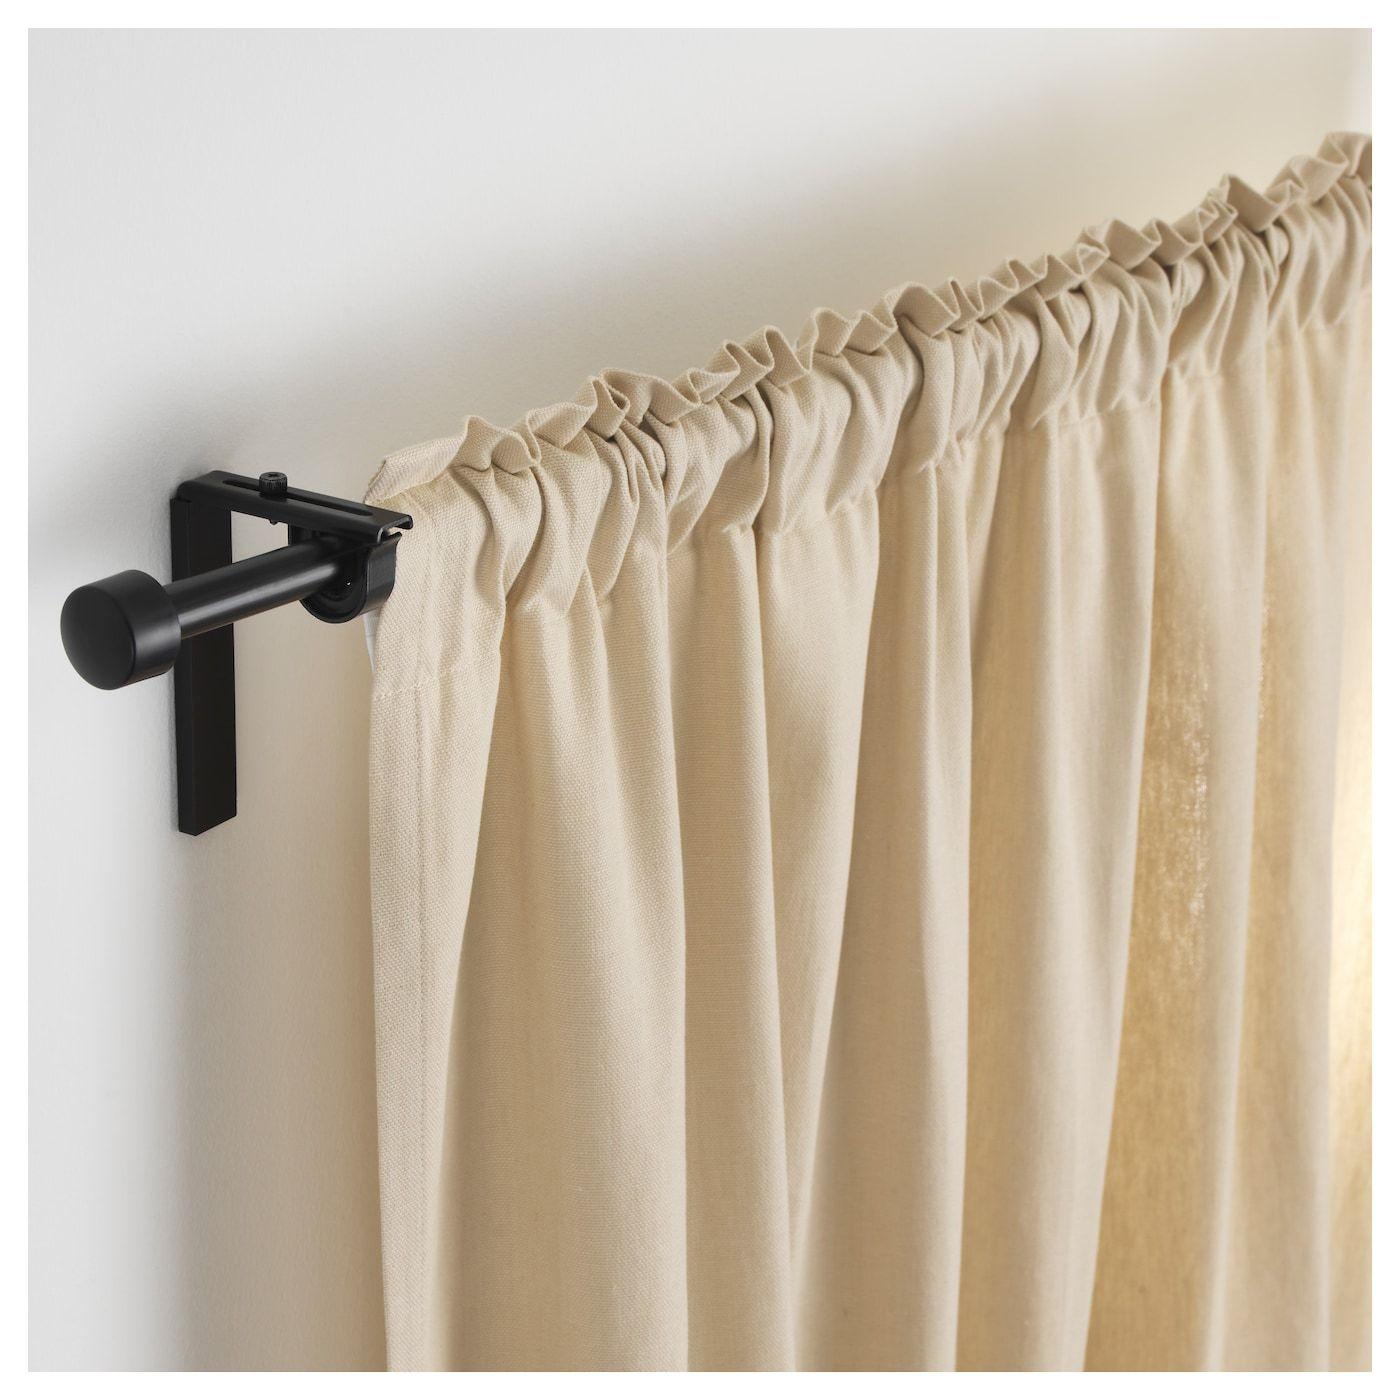 Ikea Racka Black Curtain Rod Combination In 2019 Black Curtain Rods Ikea Curtain Rods Curtain Rods